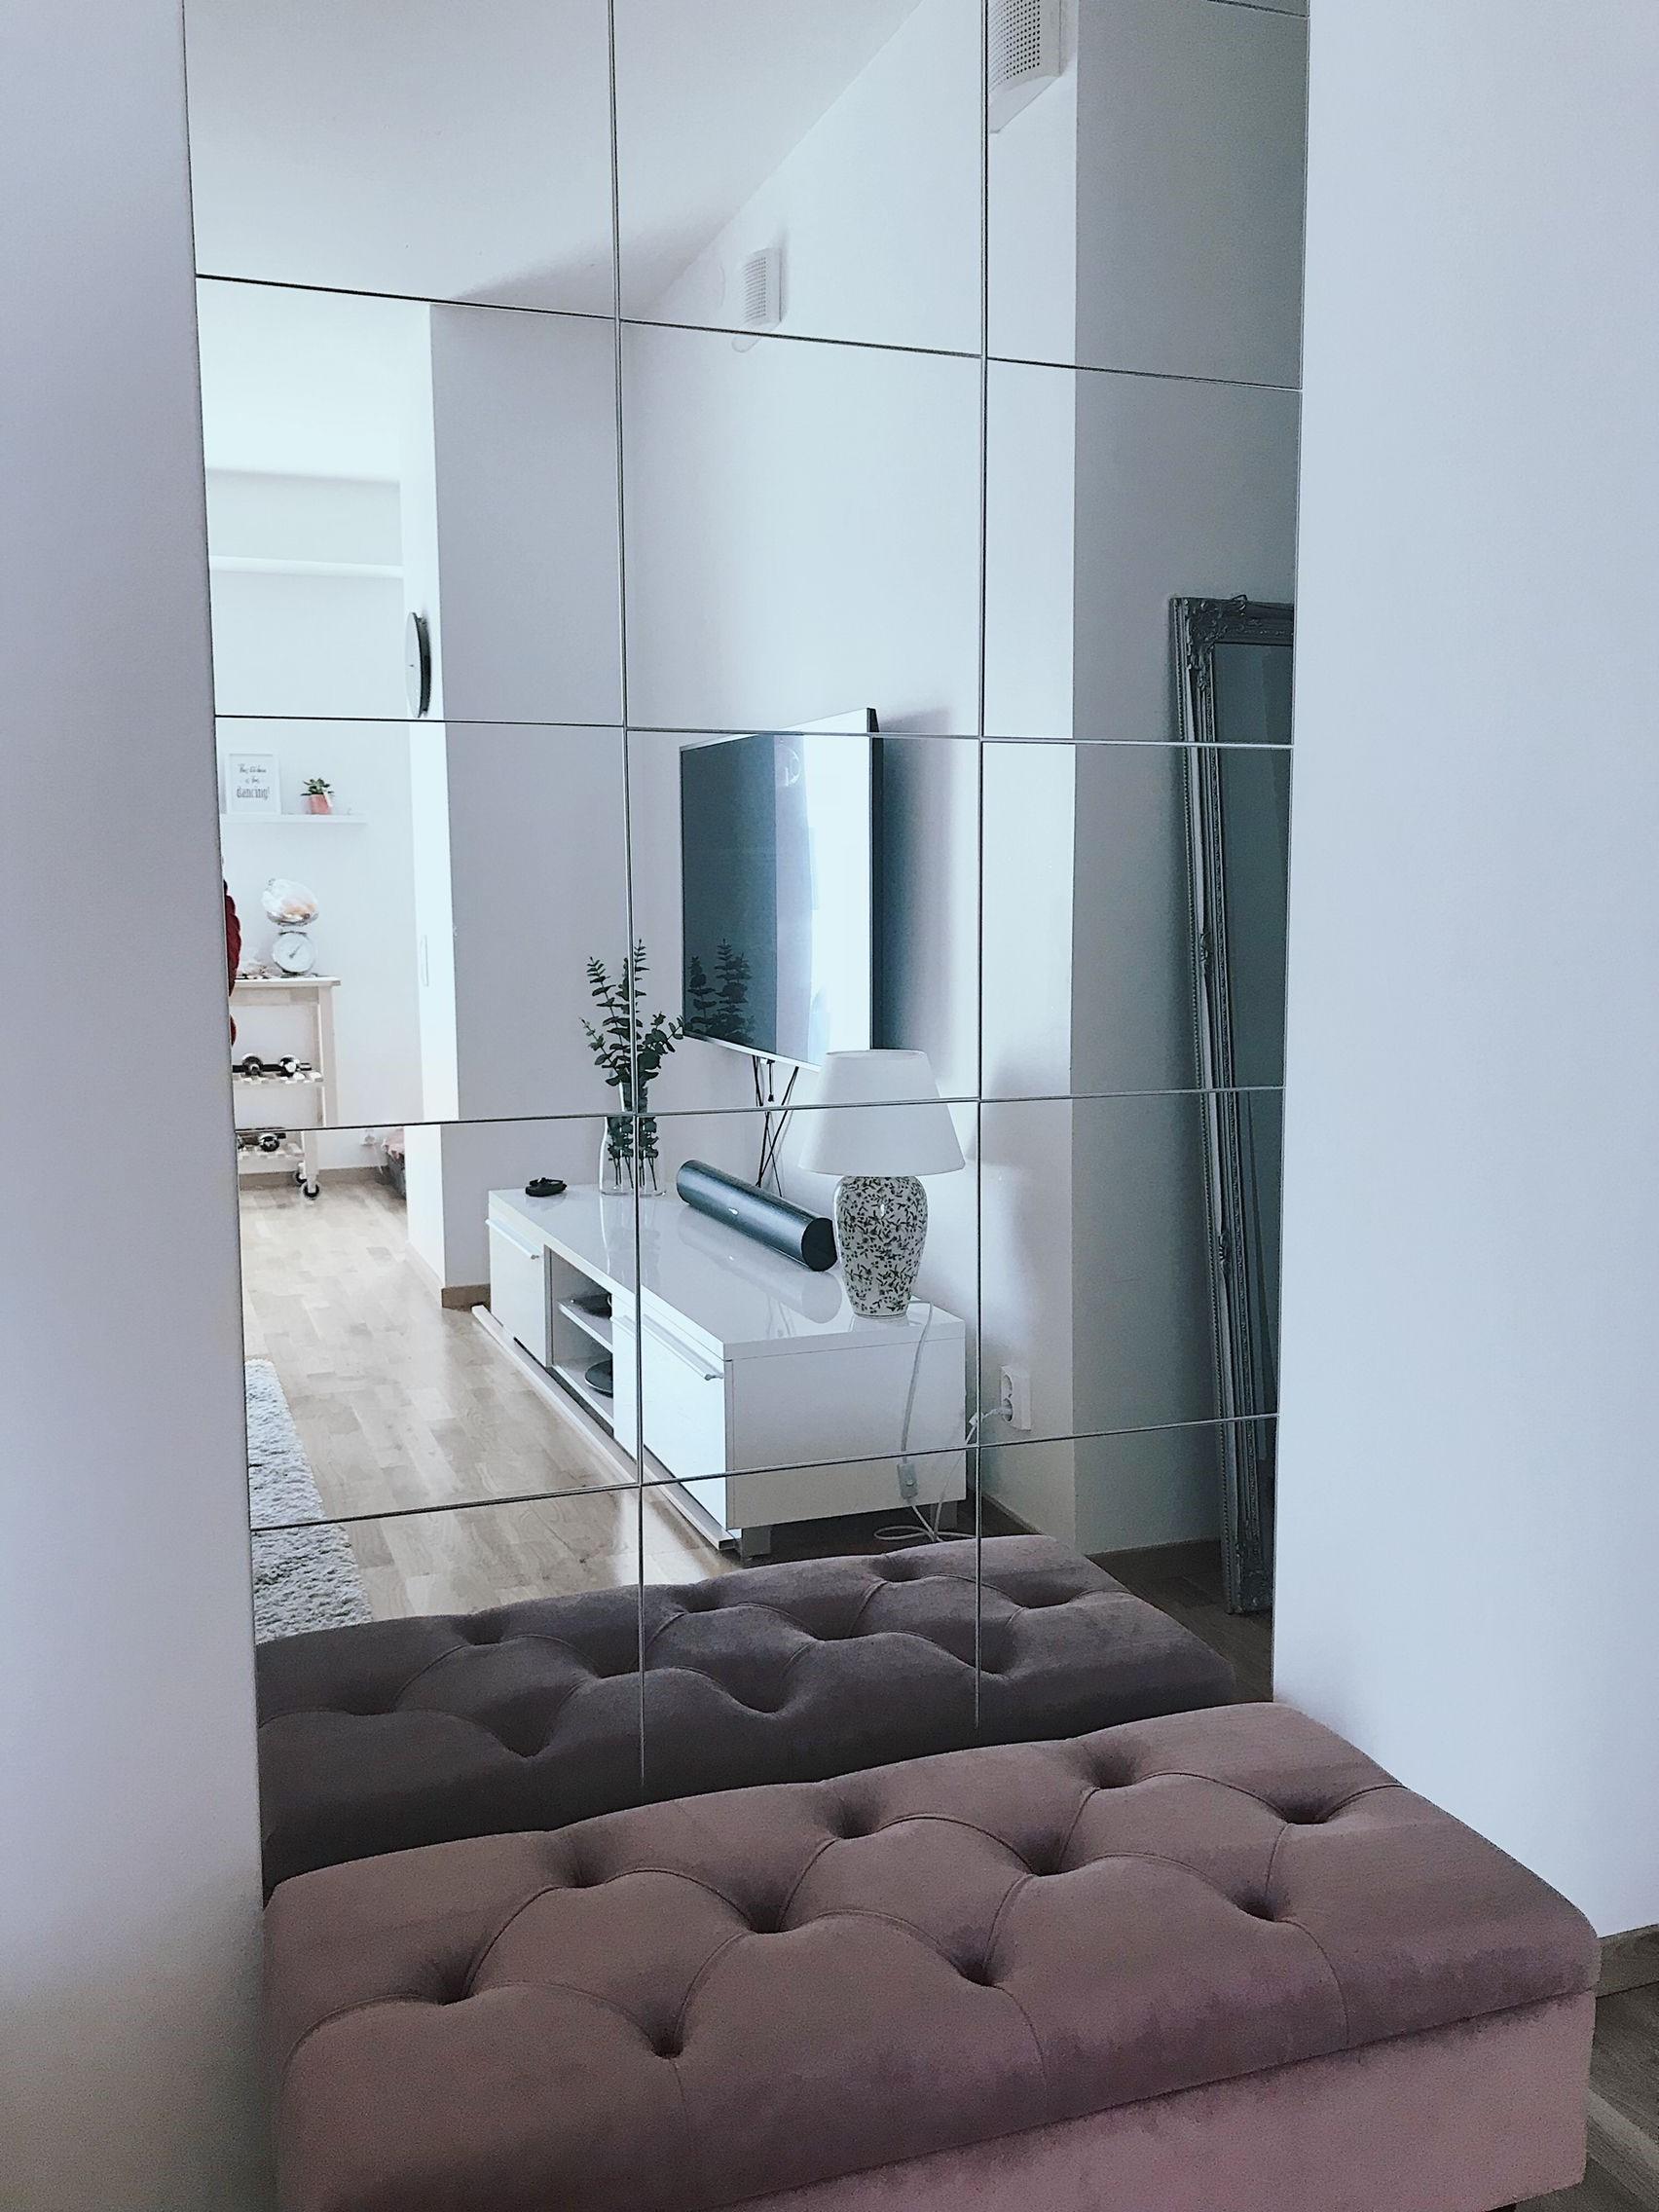 Miroir polyvalent et moderne.